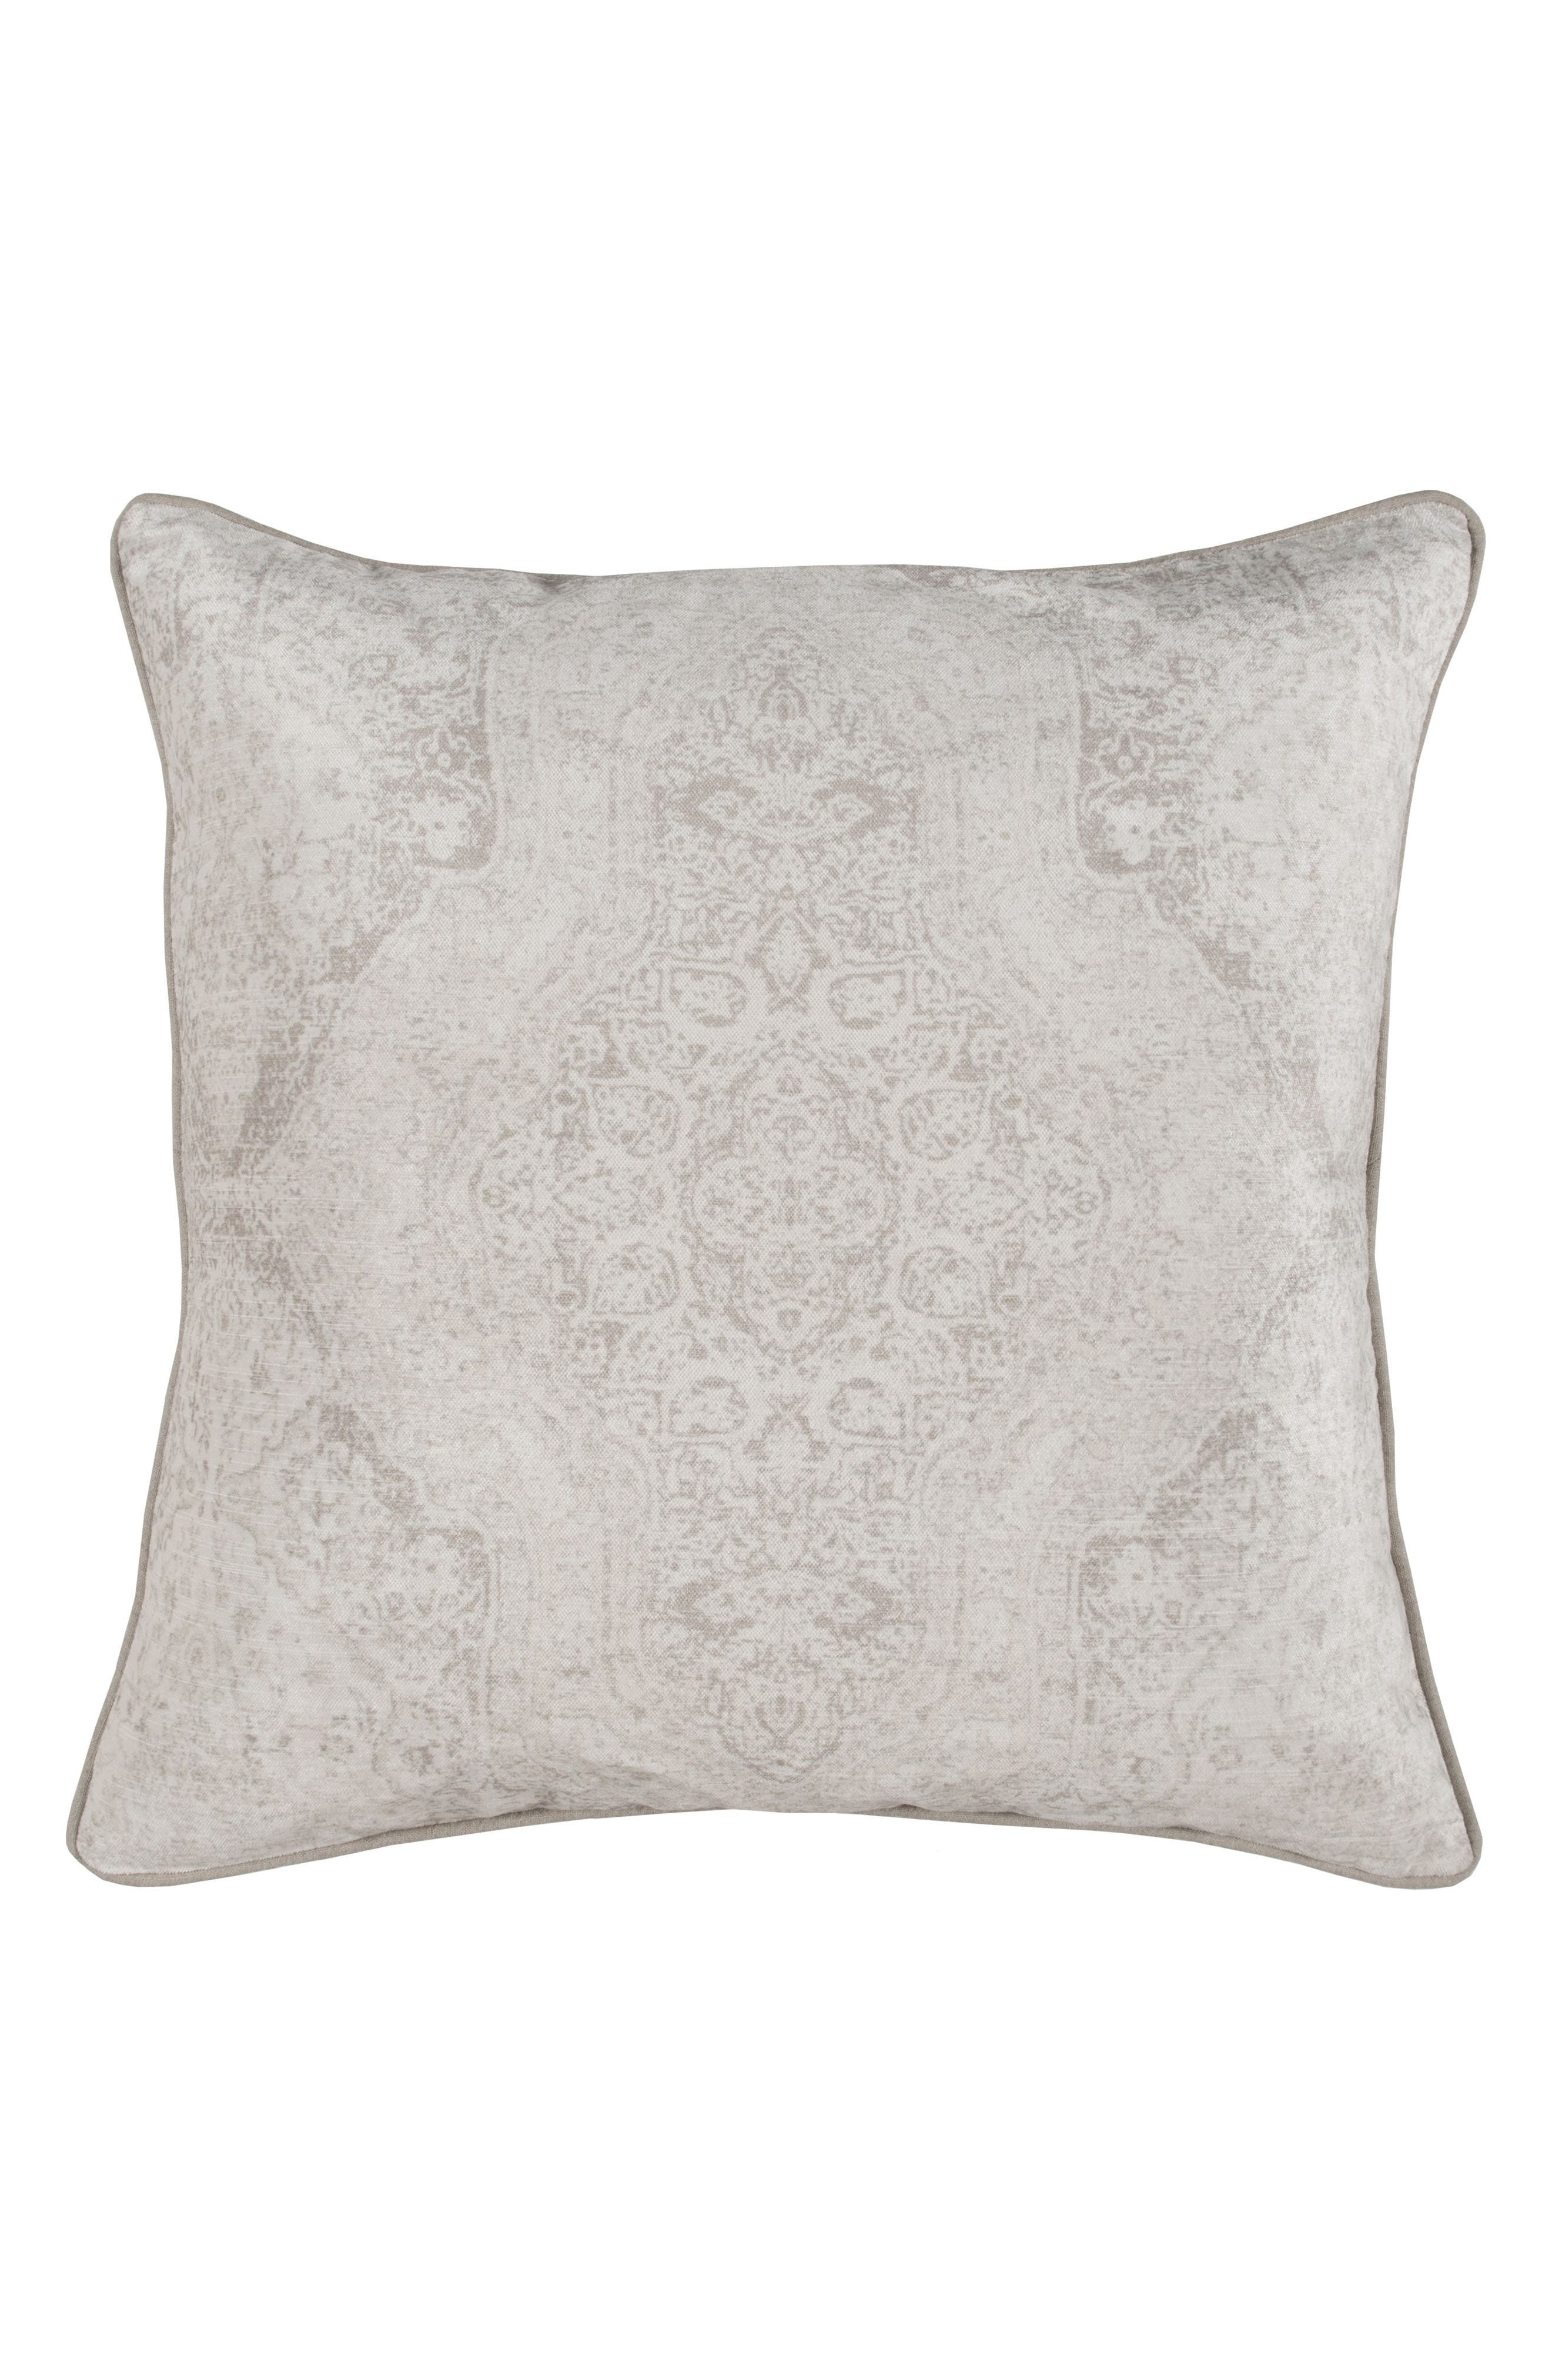 Luri Accent Pillow,                         Main,                         color, 250